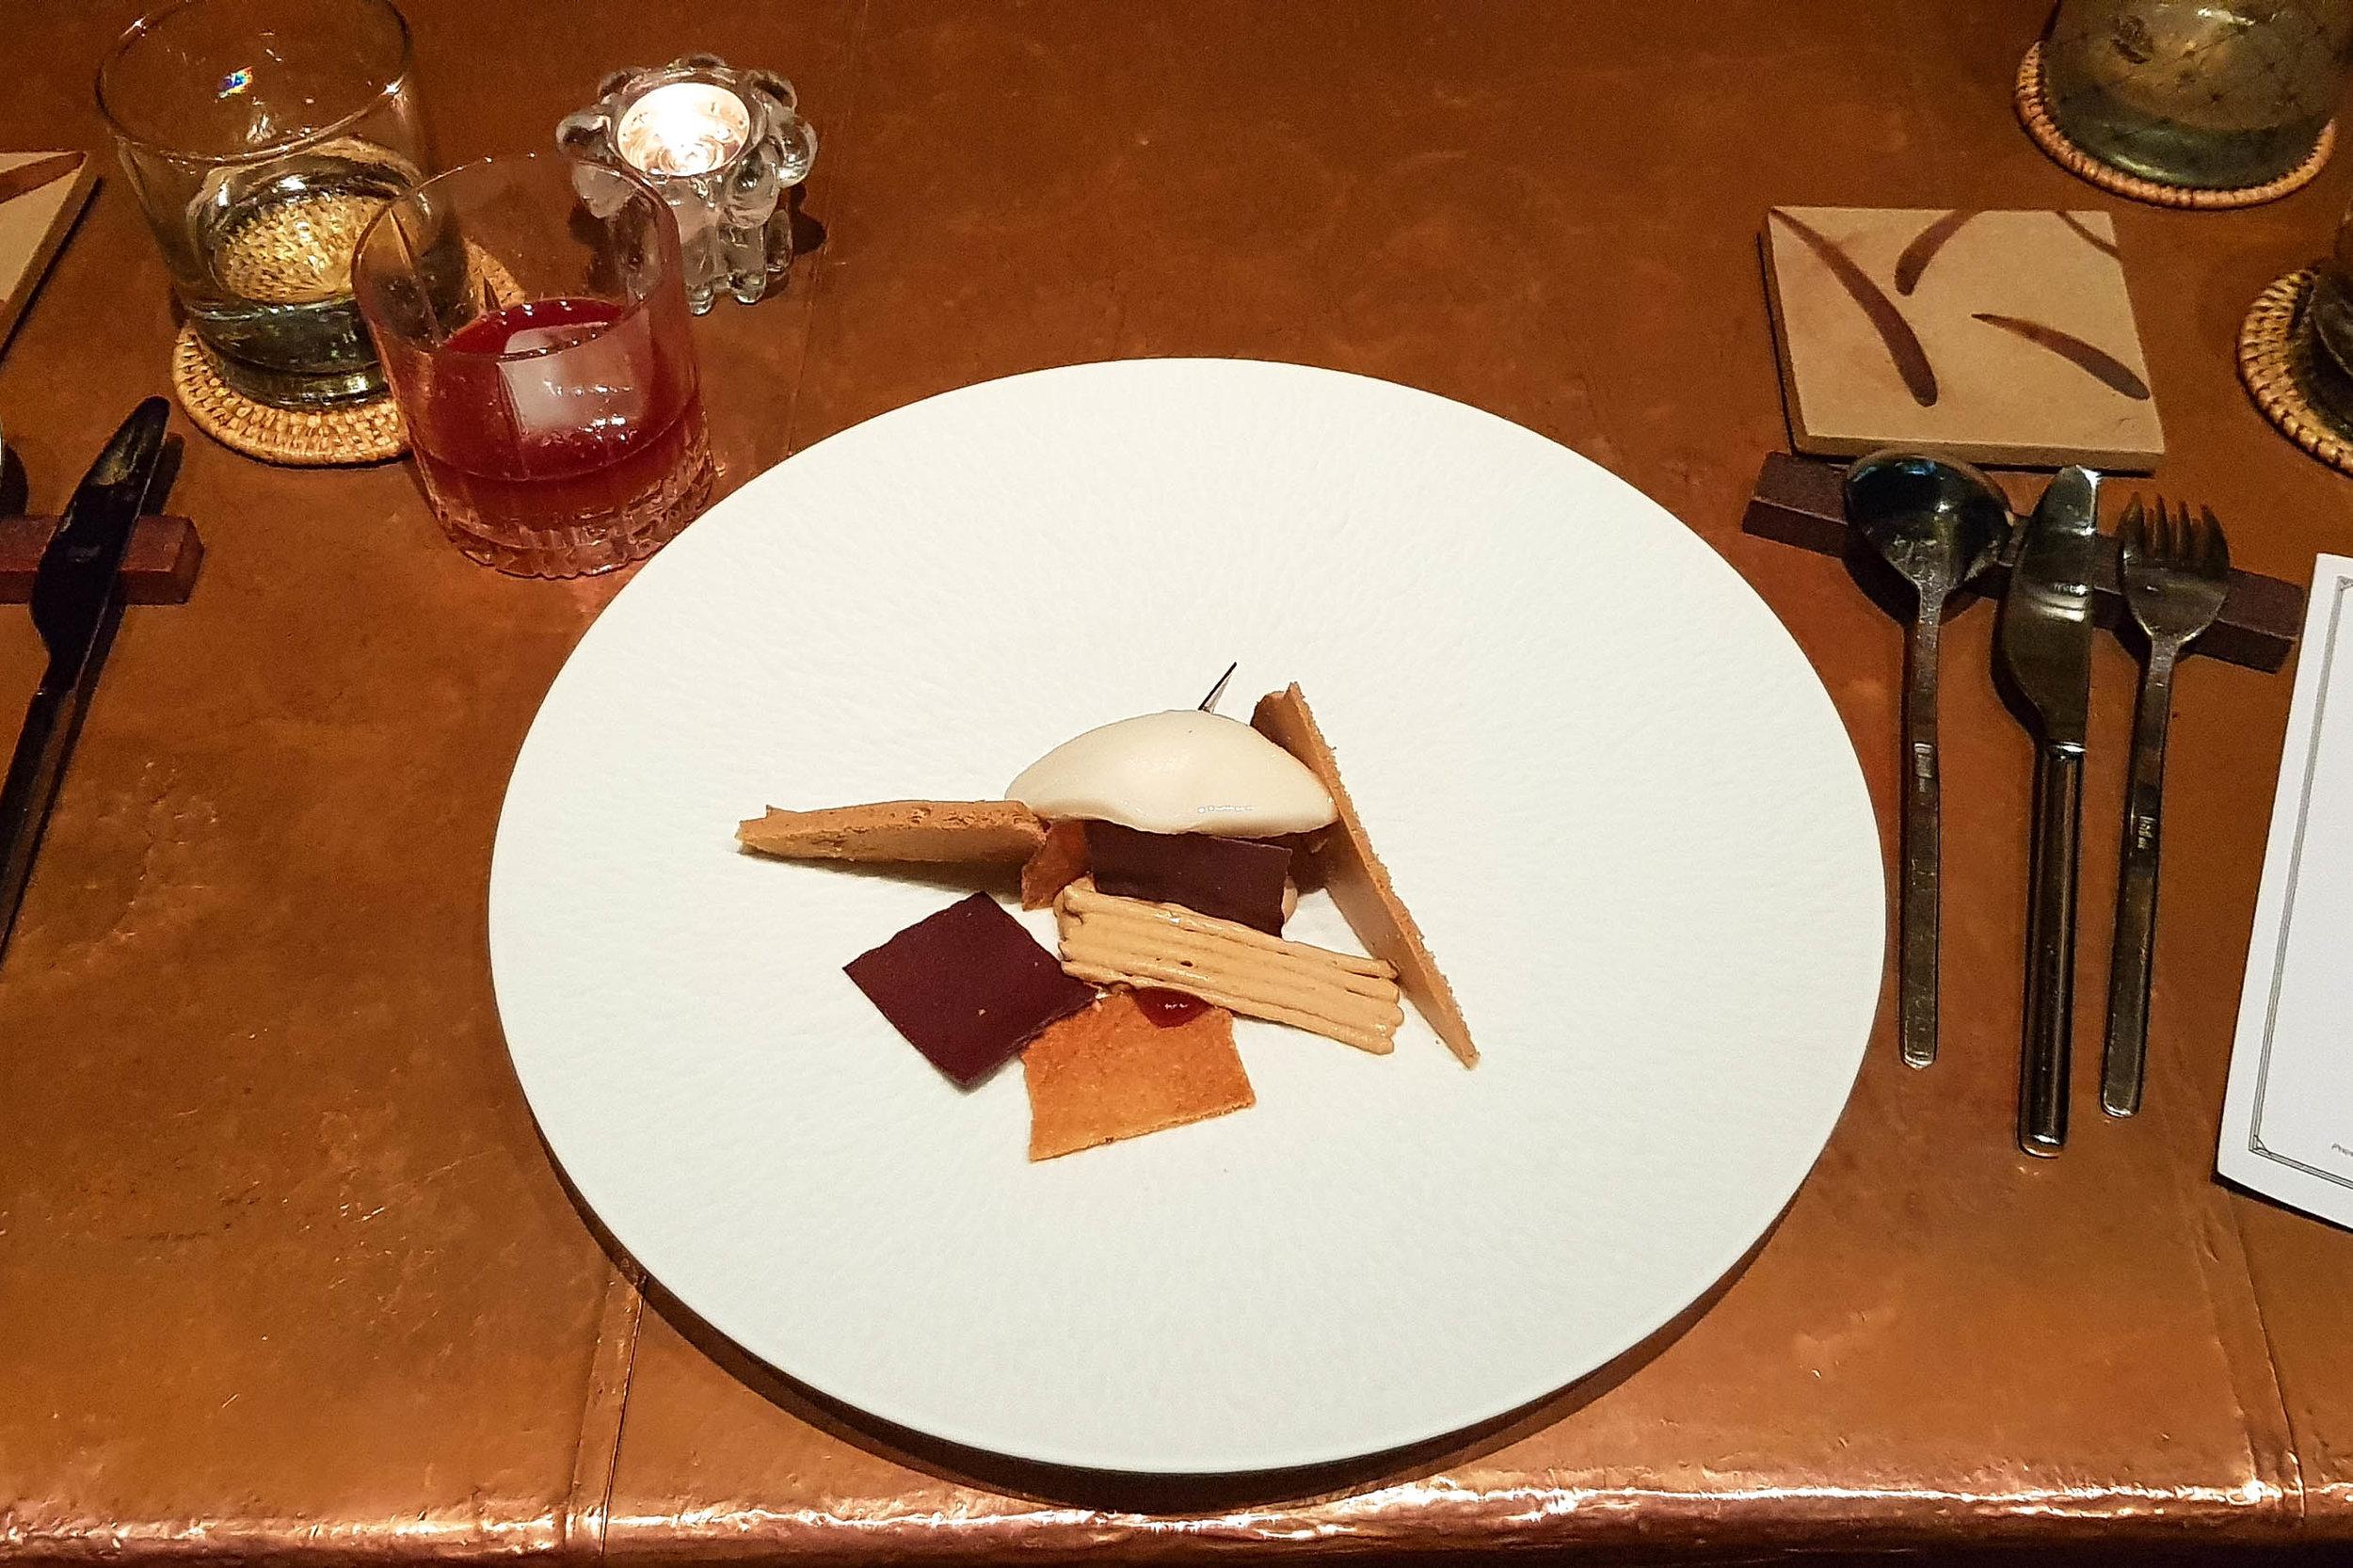 The Sugar Refinery dish at Room 4 Dessert